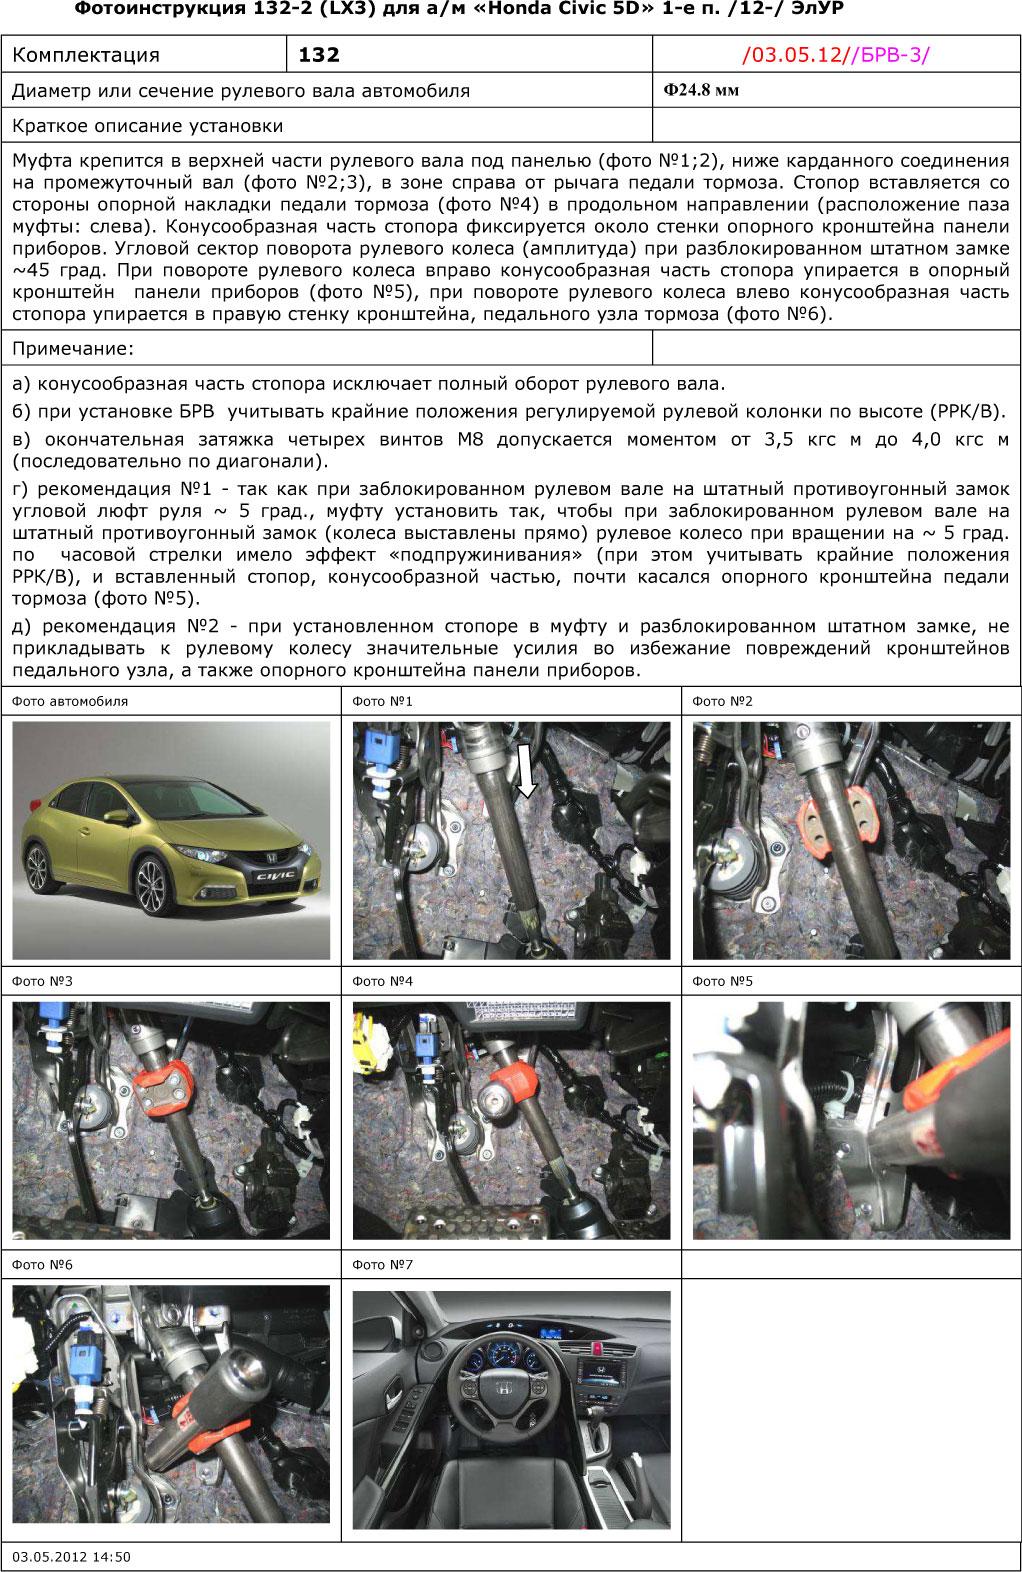 Блокиратор рулевого вала для HONDA CIVIC 5D /2012-/ ЭлУР - Гарант Блок Люкс 132.E